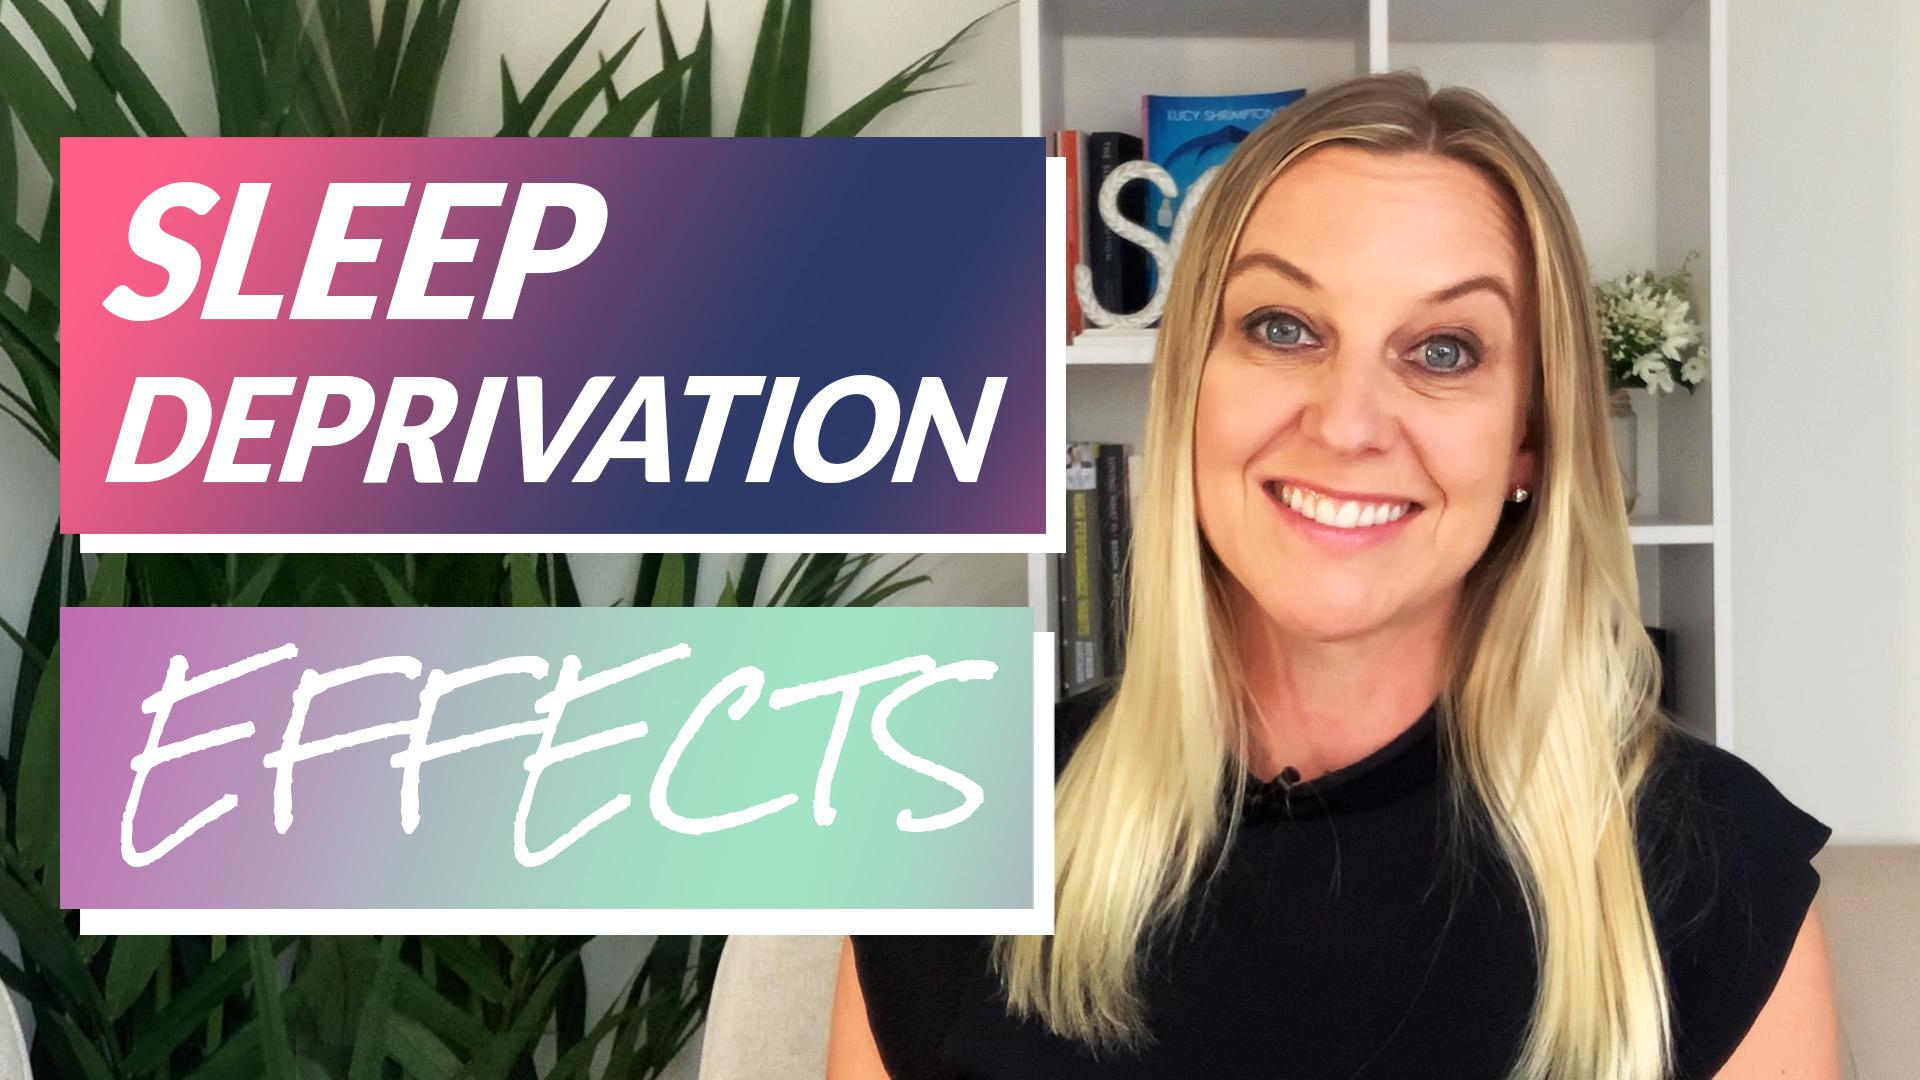 sleep deprivation effects video thumbnail